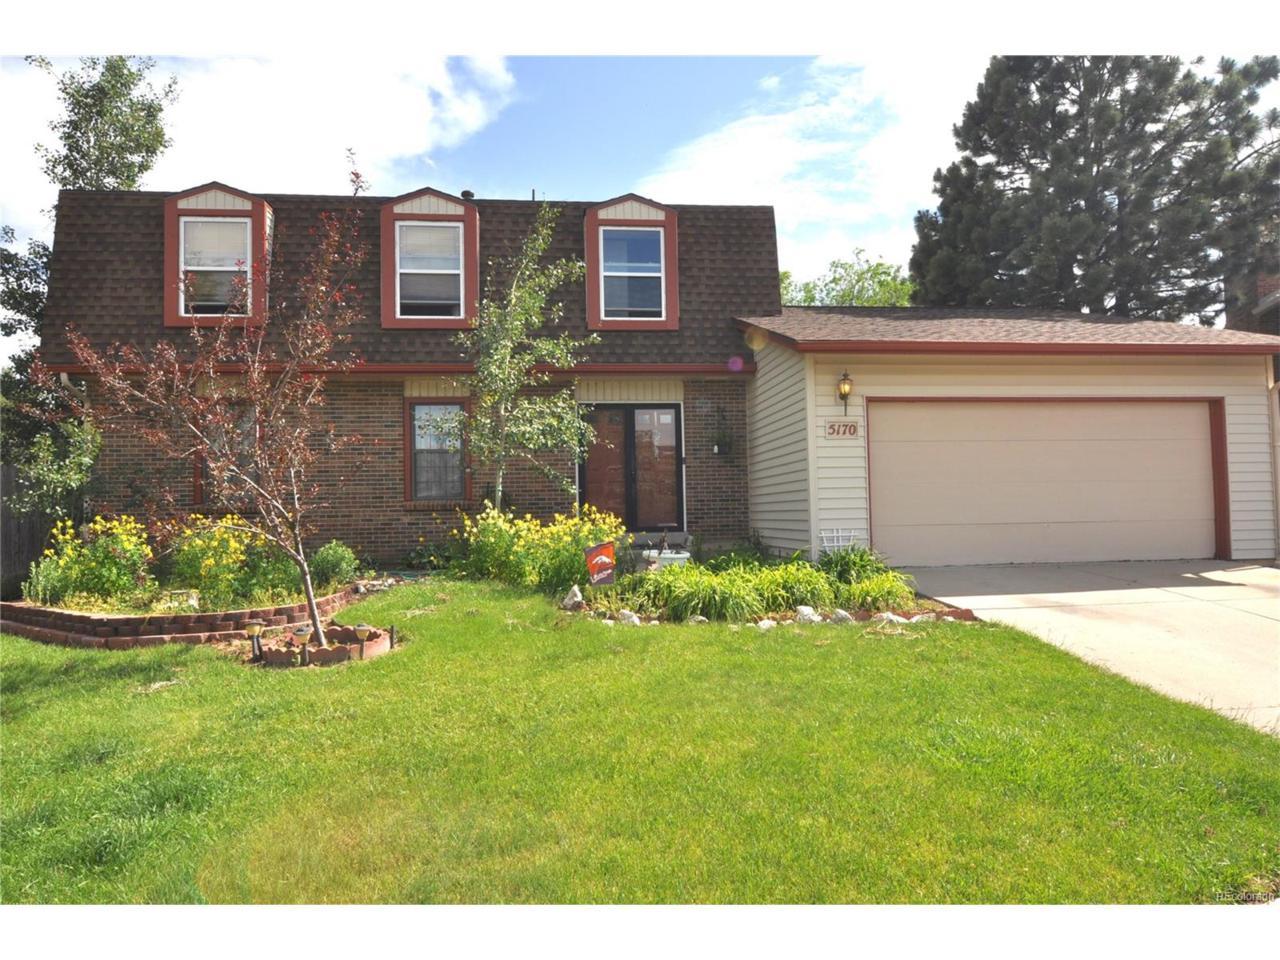 5170 S Telluride Street, Centennial, CO 80015 (MLS #7204228) :: 8z Real Estate